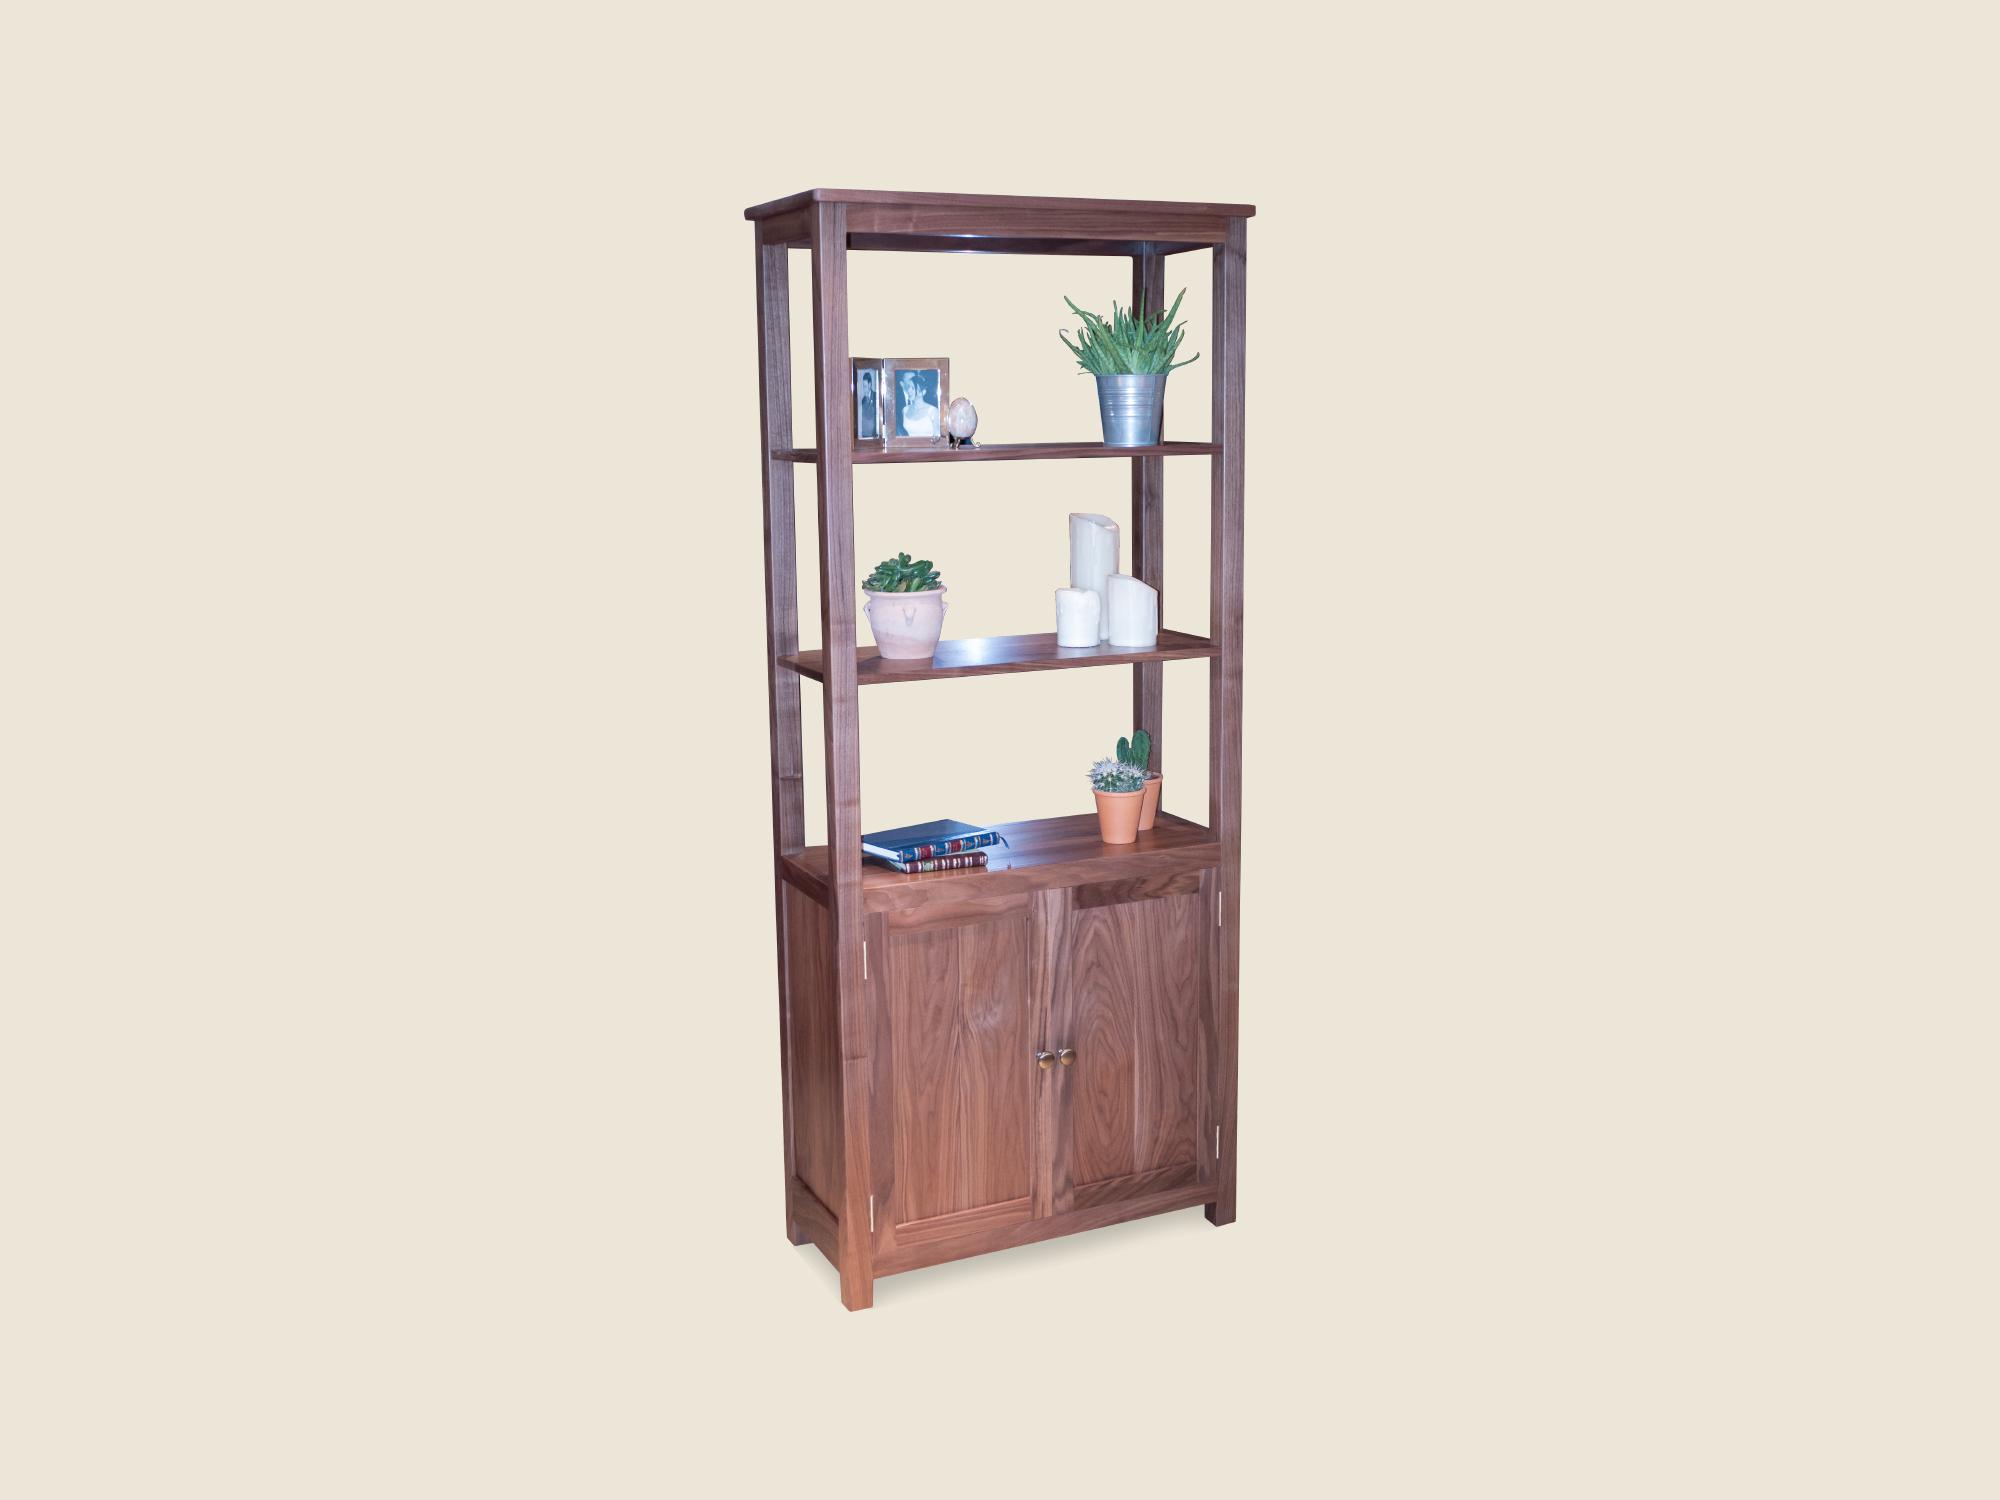 walnut-bookcase-shelves.jpg